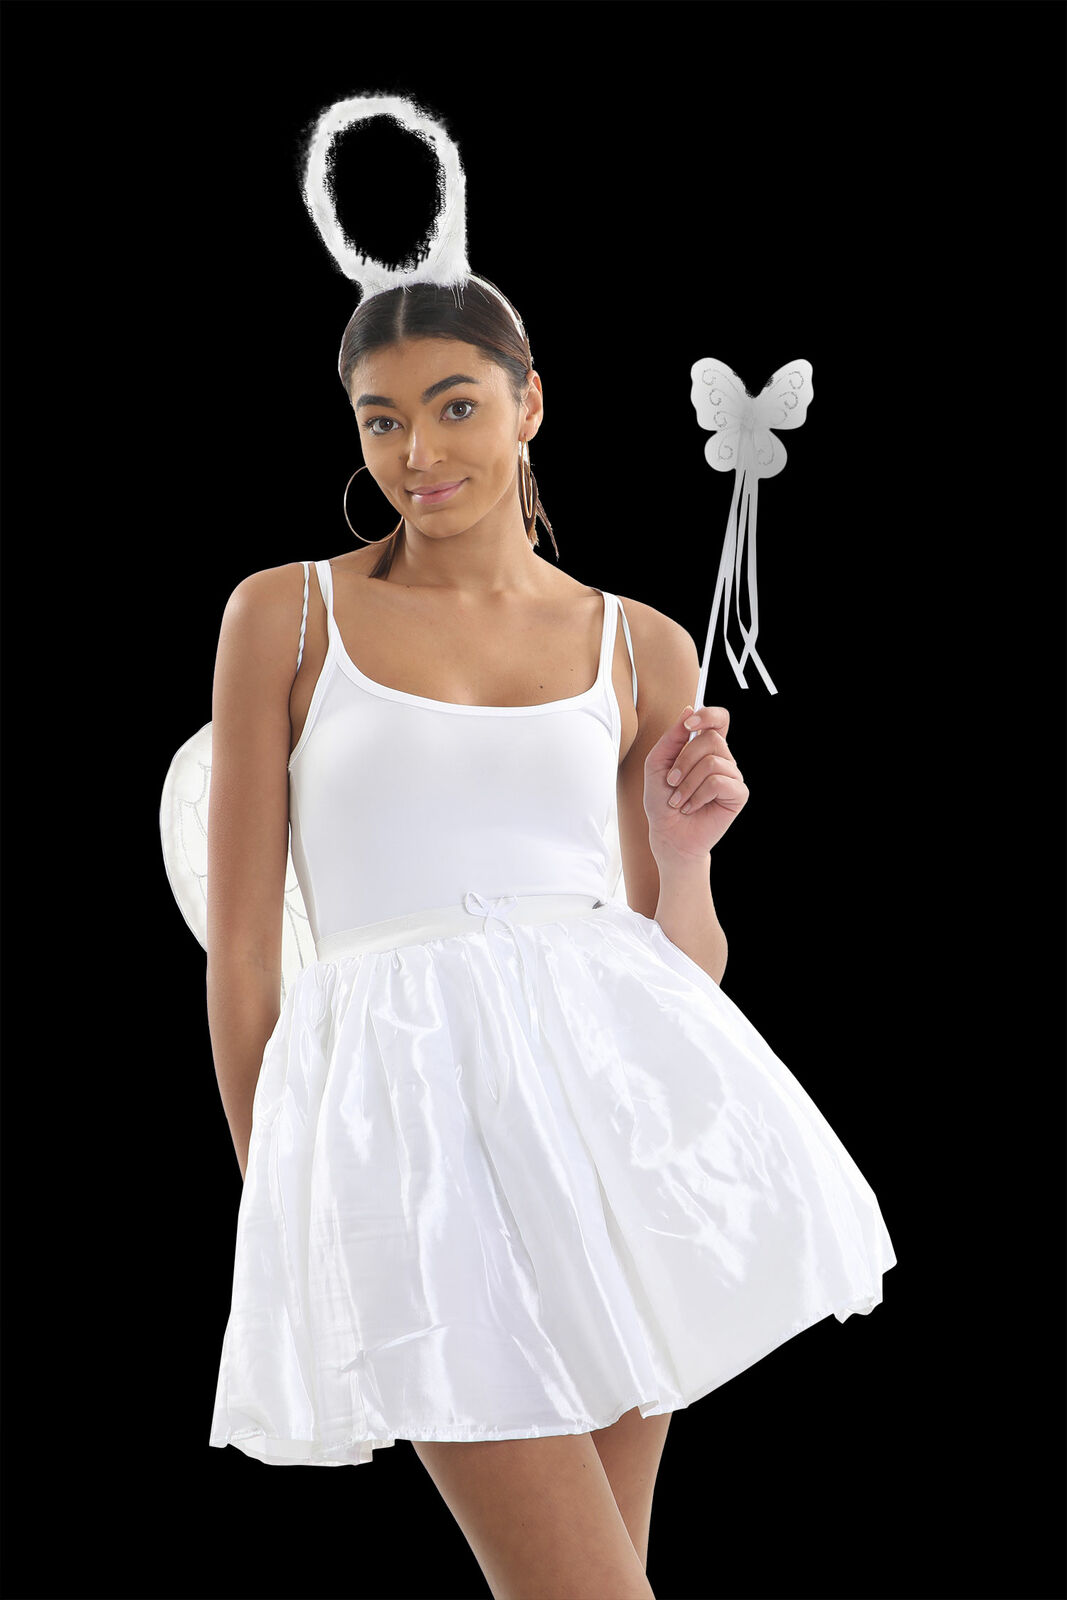 WHITE ANGEL TUTU SKIRT WOMENS 3 LAYER SATIN BALLET DANCE FANCY DRESS HEN PARTY